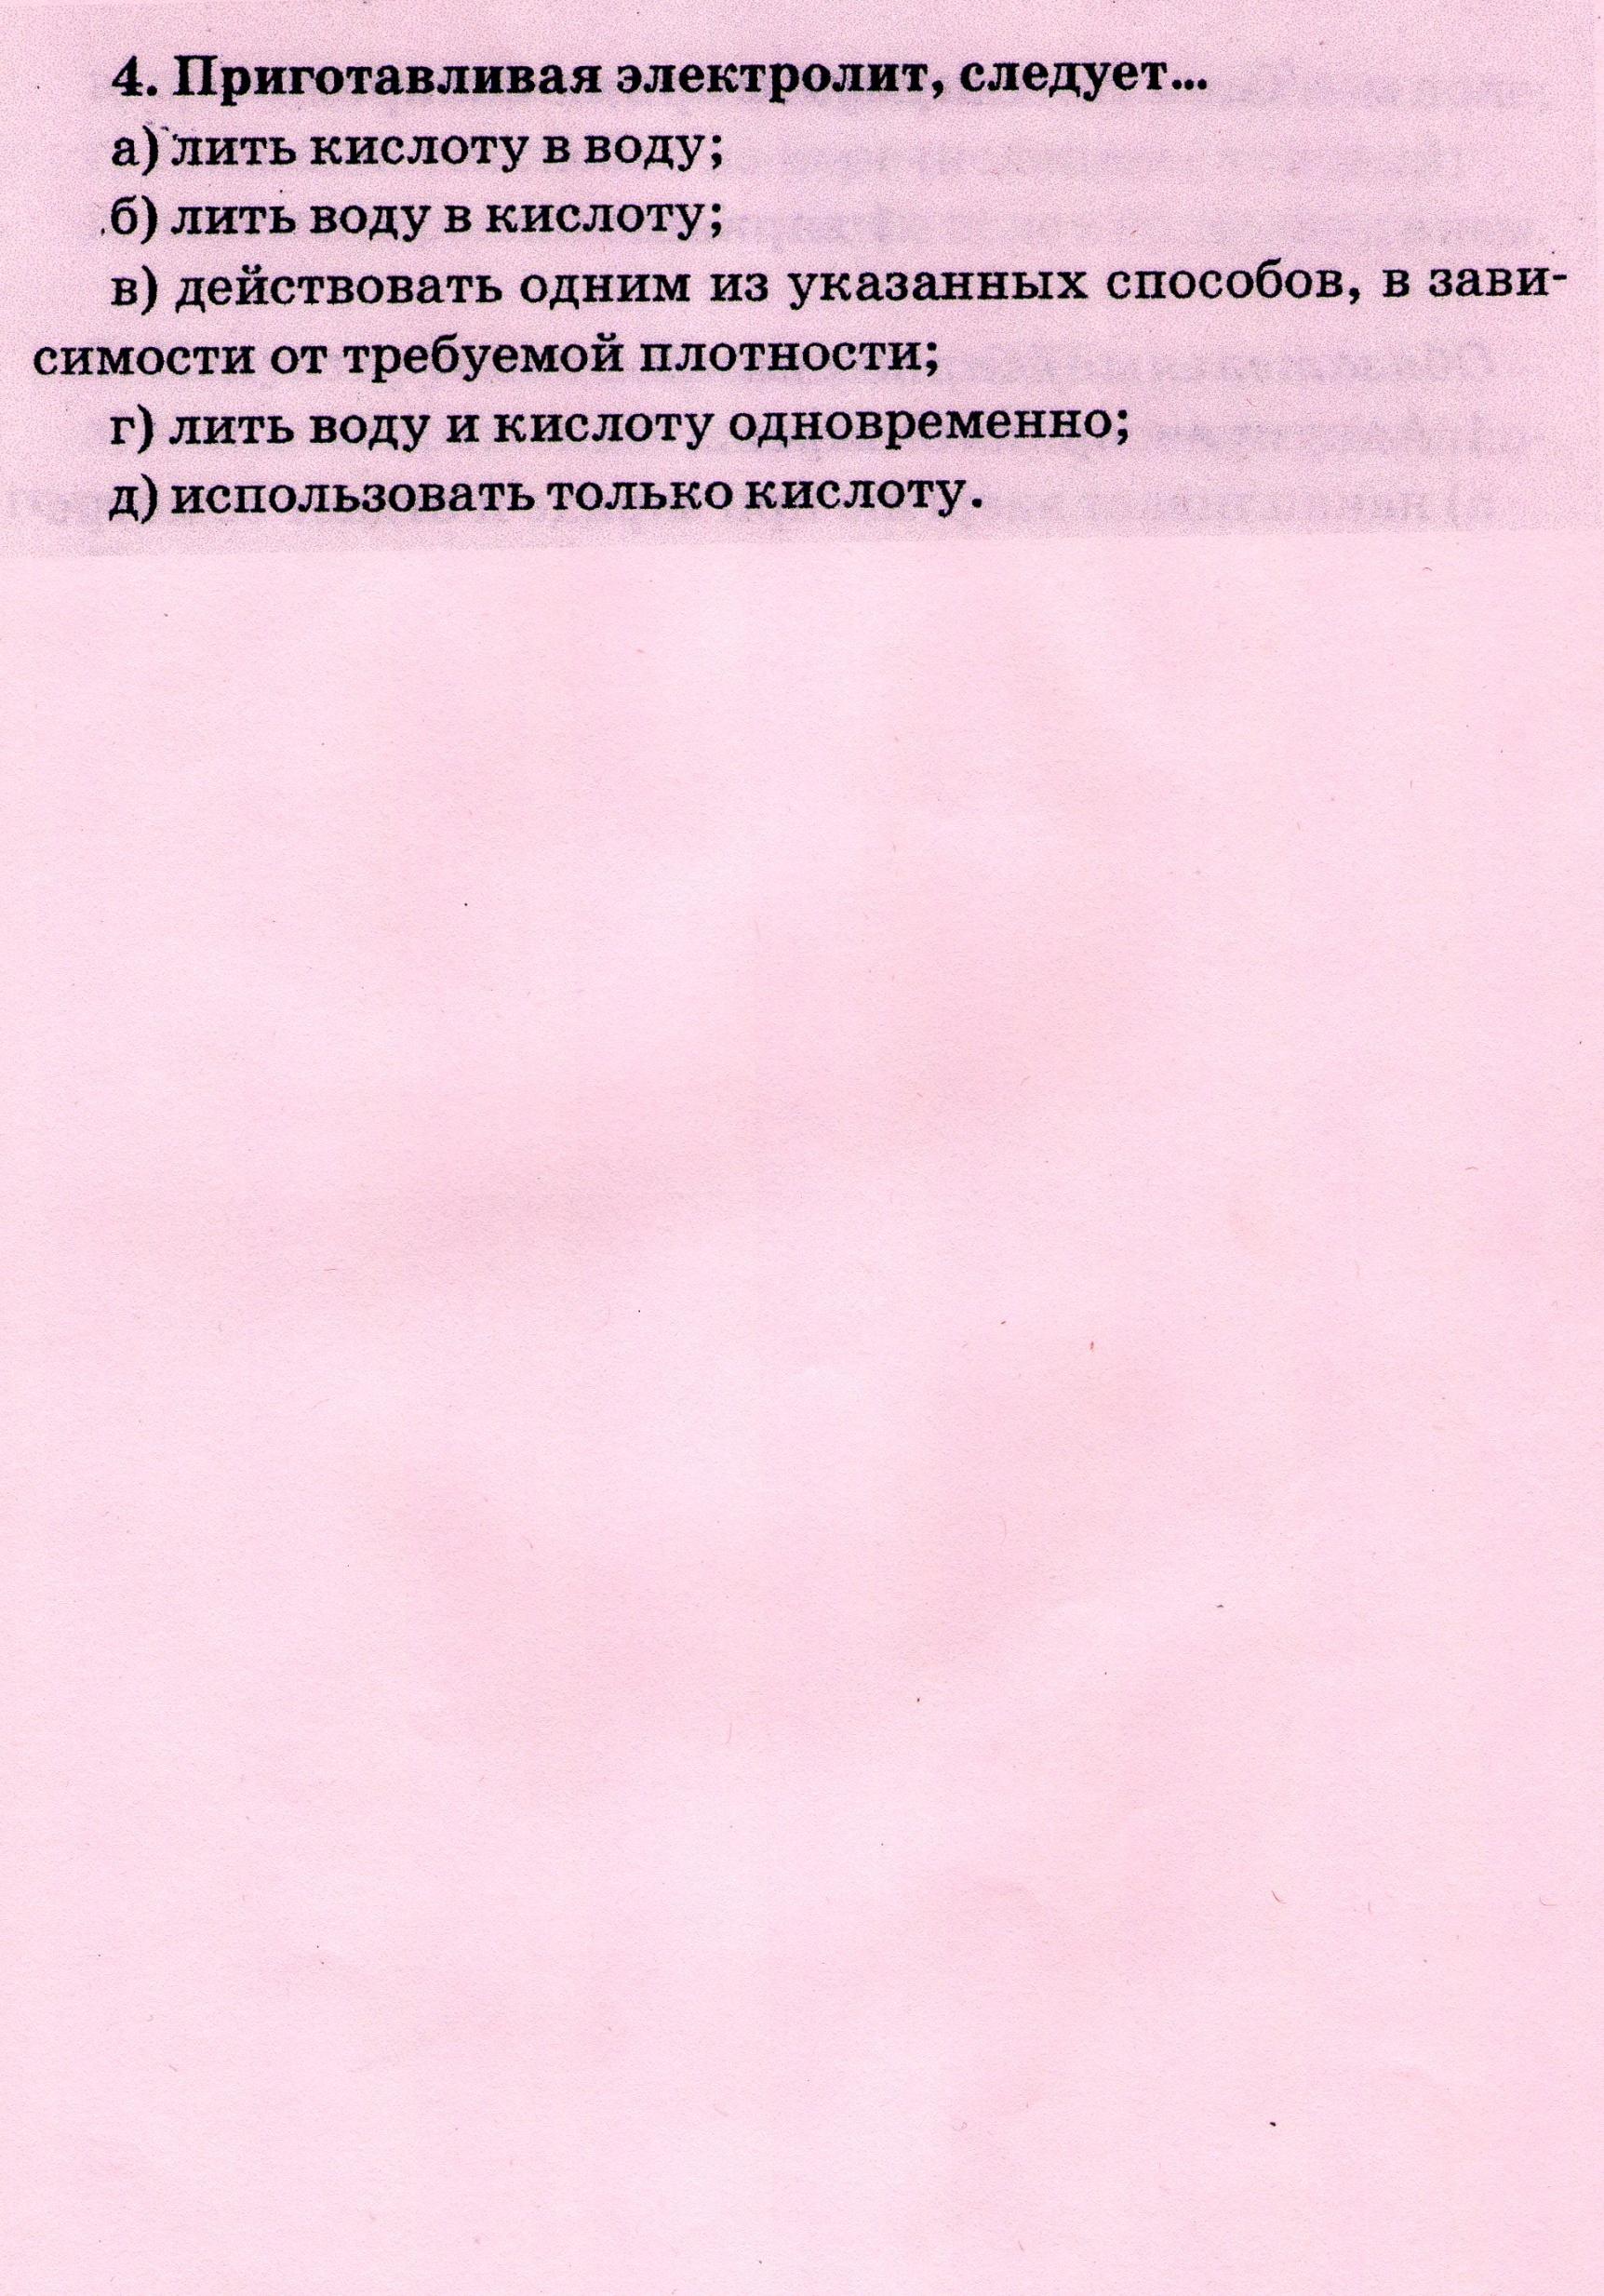 C:\Users\Василий Мельченко\Pictures\img540.jpg